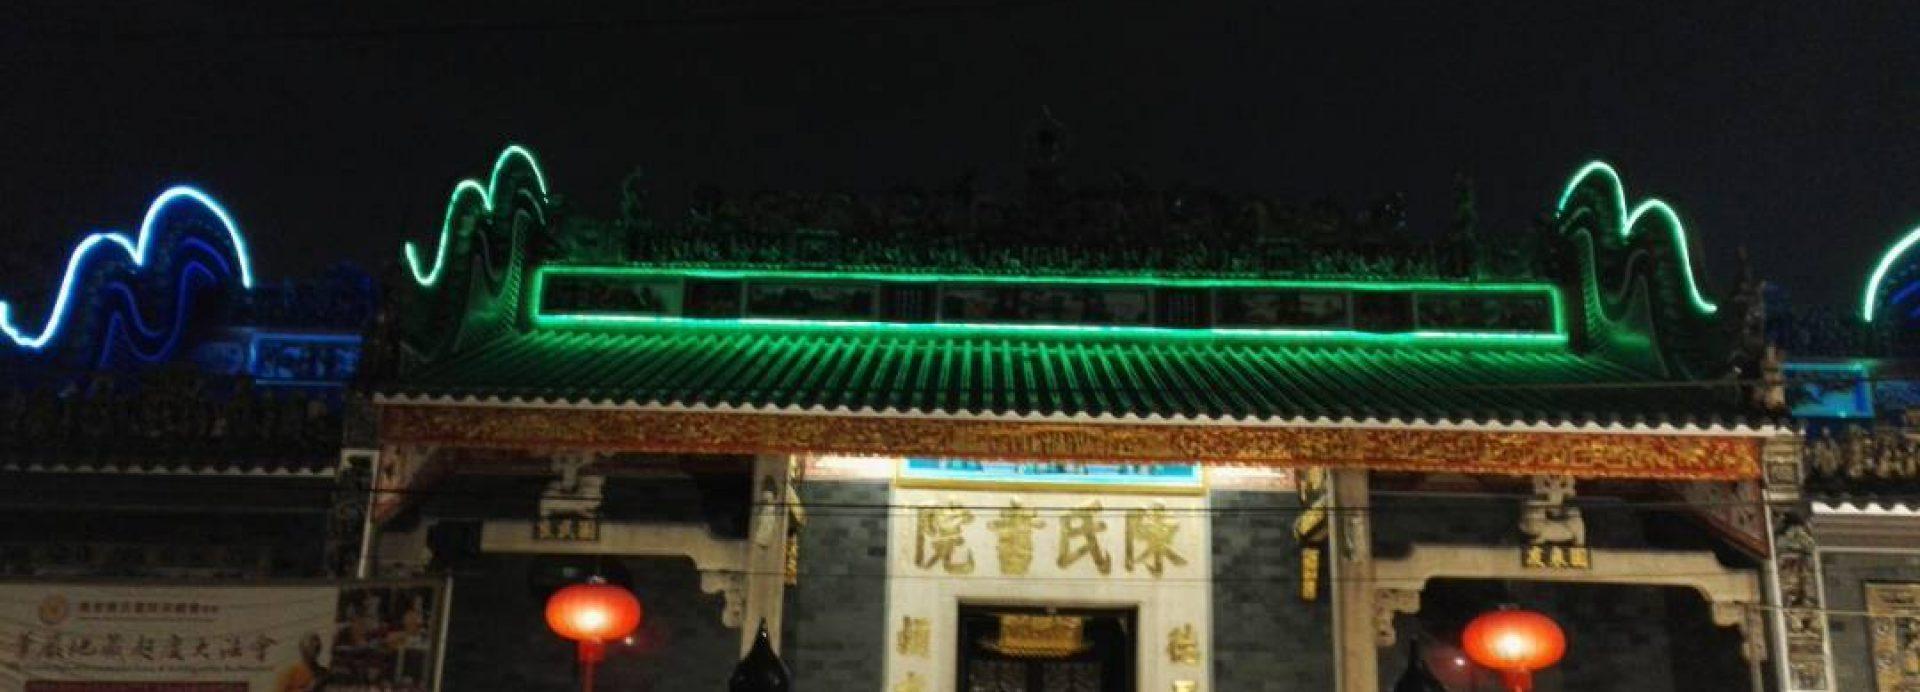 陈氏书院的LED